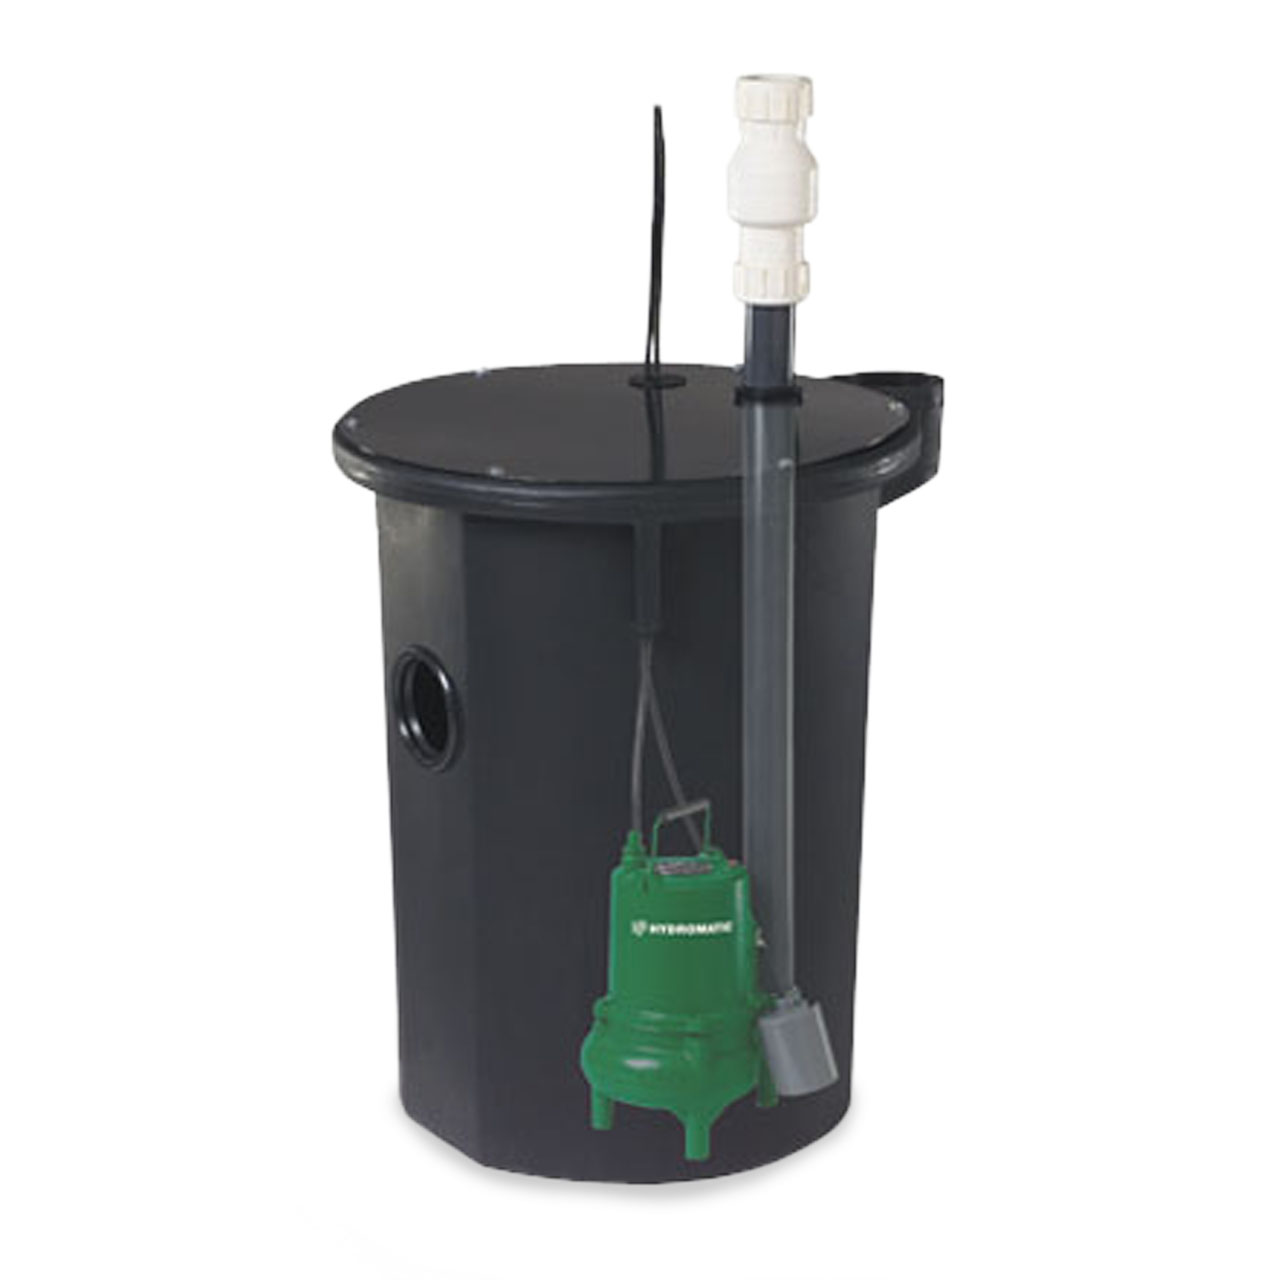 Hydromatic Pump Hydromatic 224 Unassembled Sewage